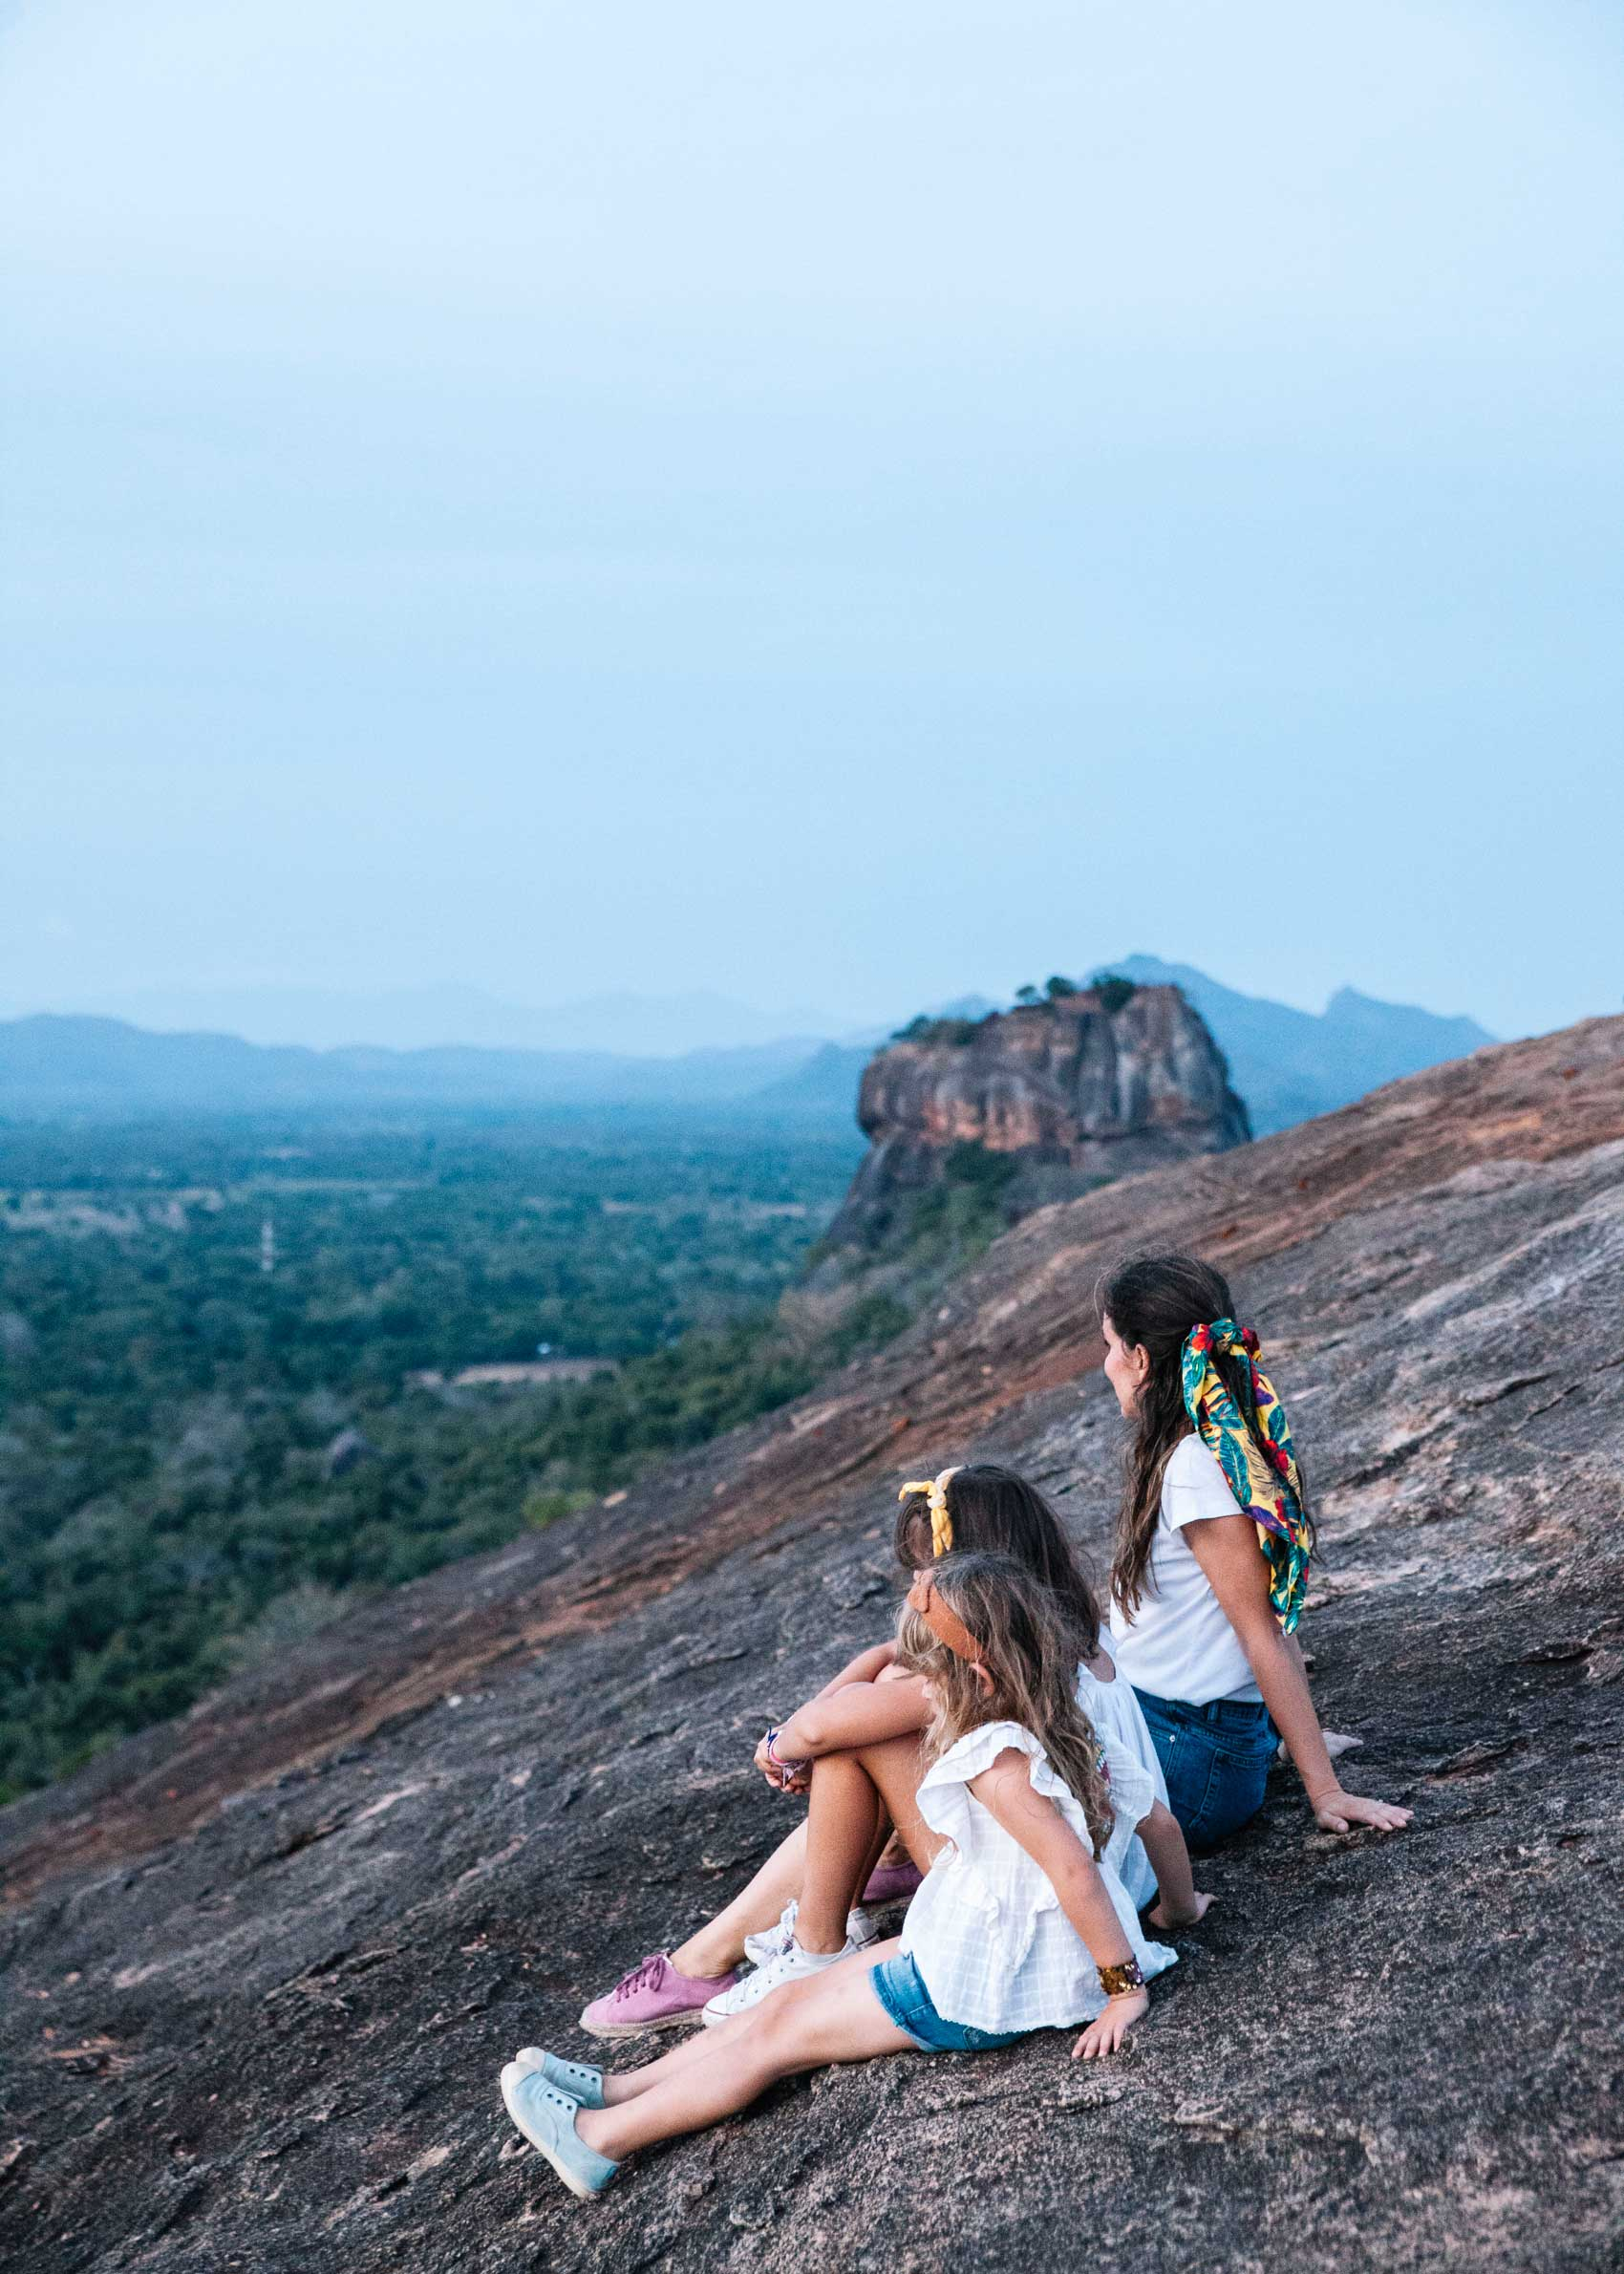 Itinerario de viaje a Sri Lanka